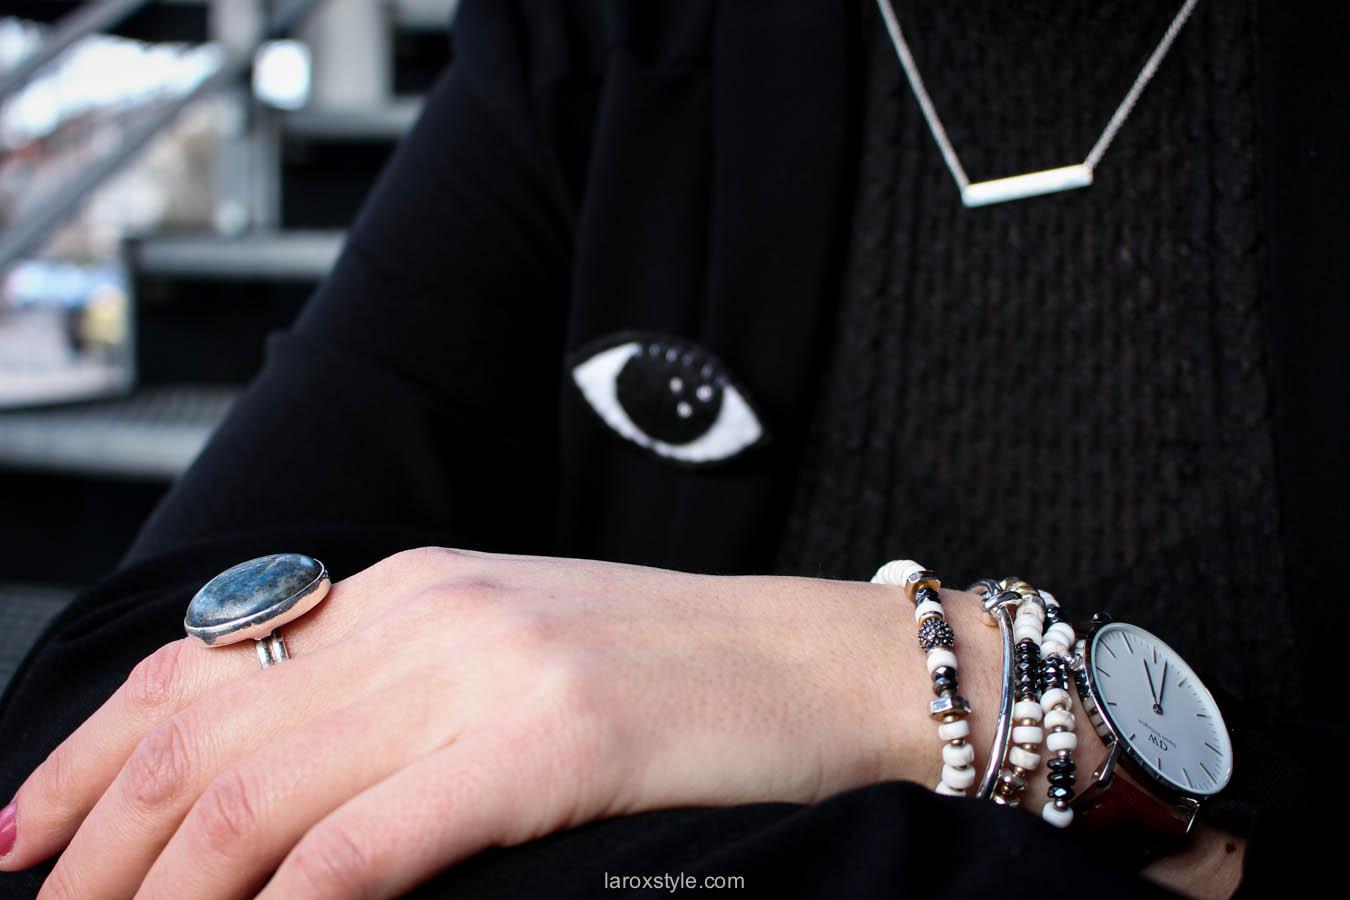 laroxstyle - blog mode lyon look pantalon fluide (21 sur 29)